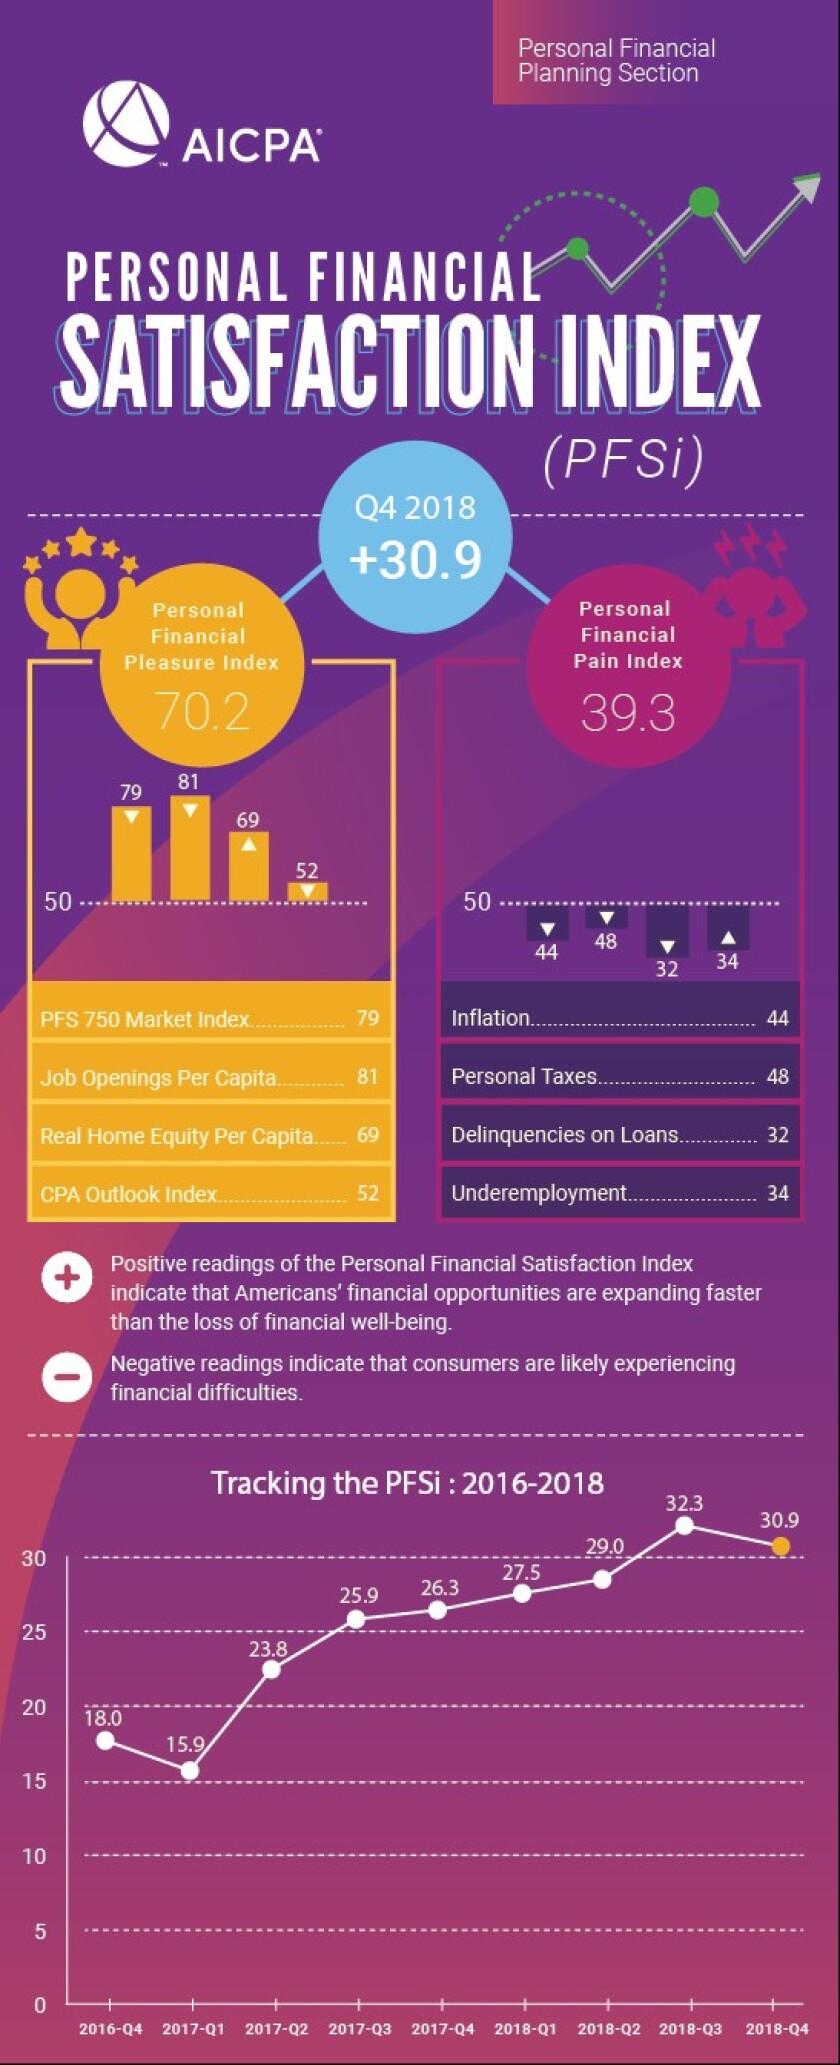 AICPA Personal Financial Satisfaction Index